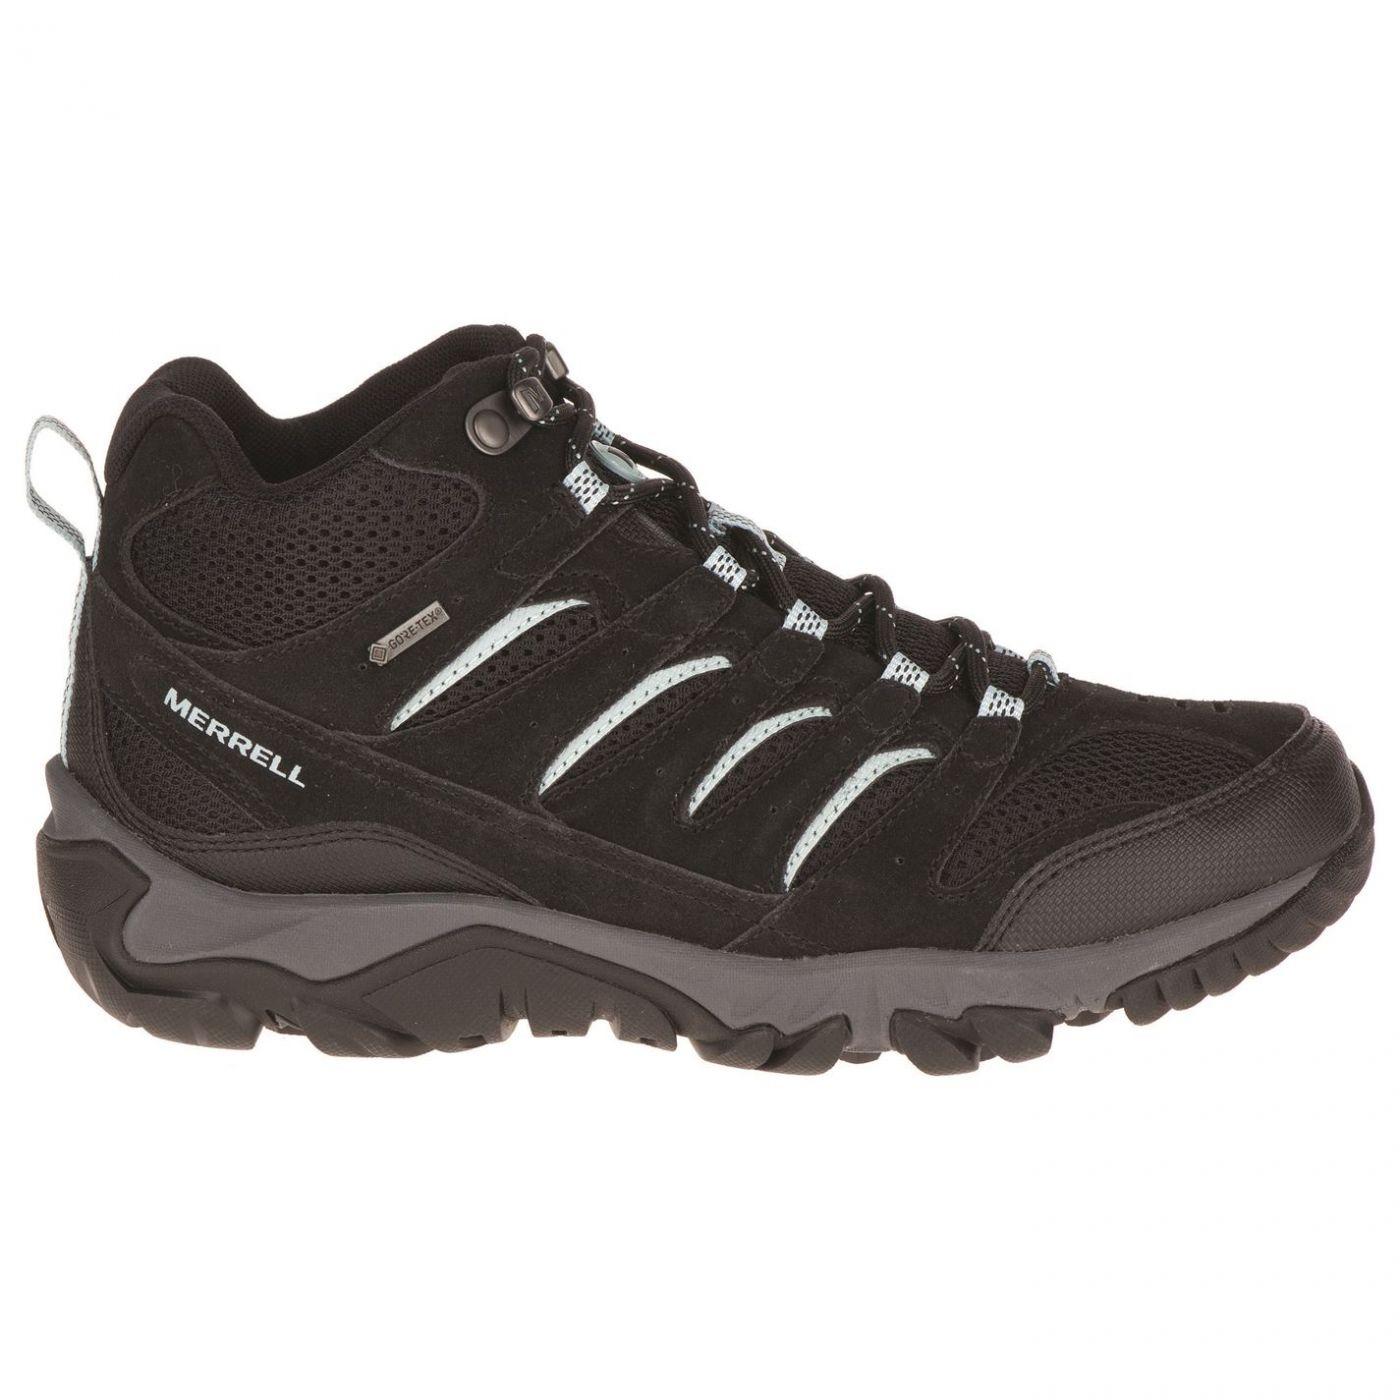 Merrell Pine Ventilator Mid GTX Ladies Walking Shoes